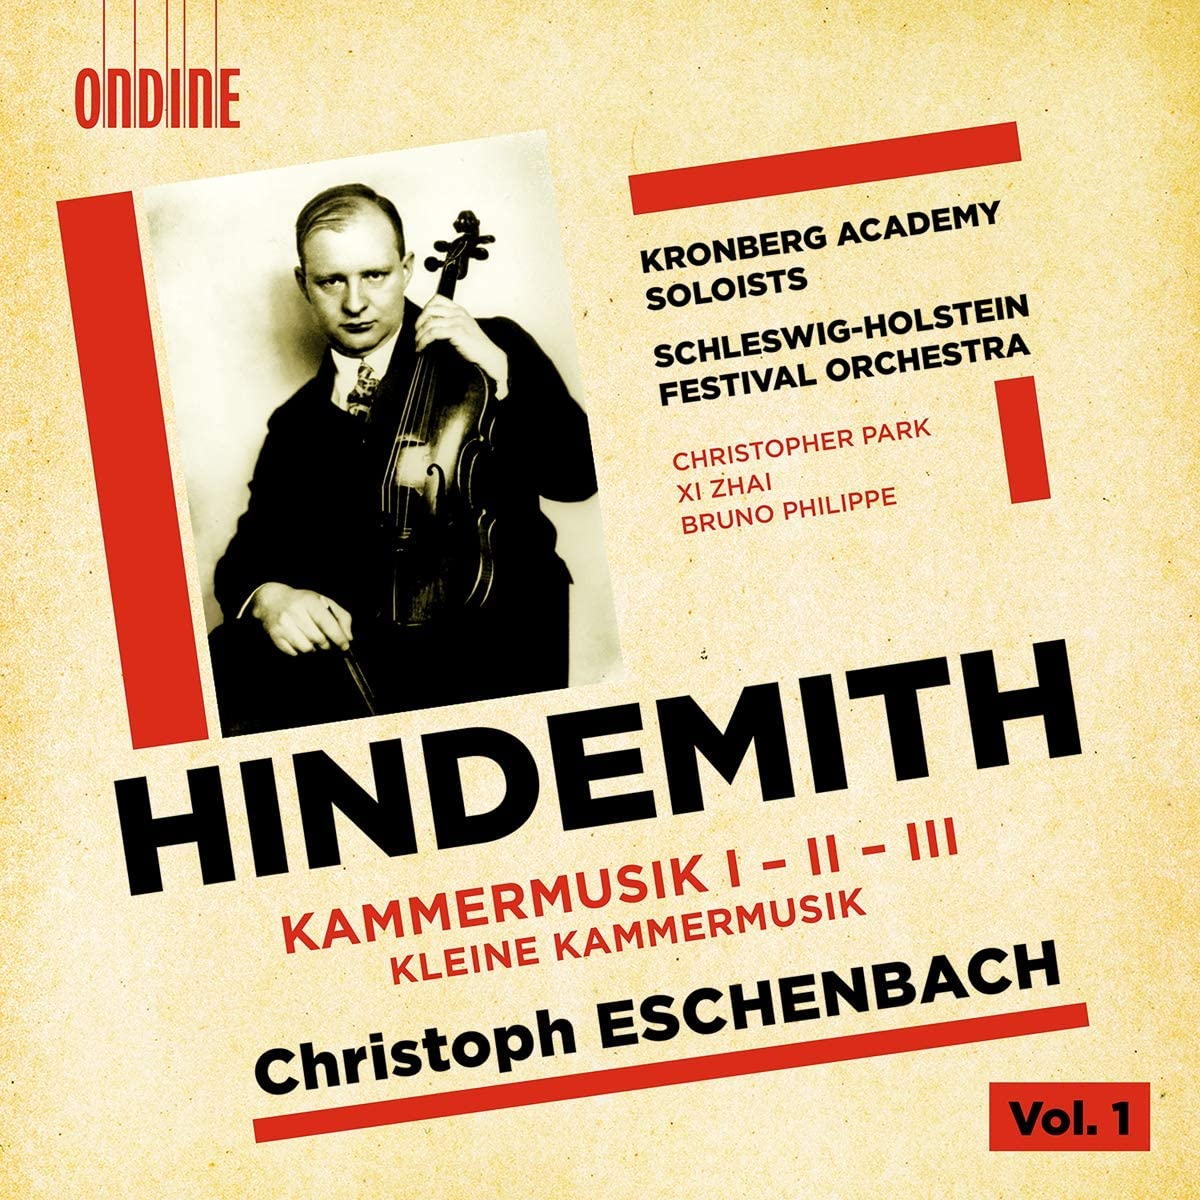 Review of HINDEMITH Kammermusic I-III. Kleine Kammermusik